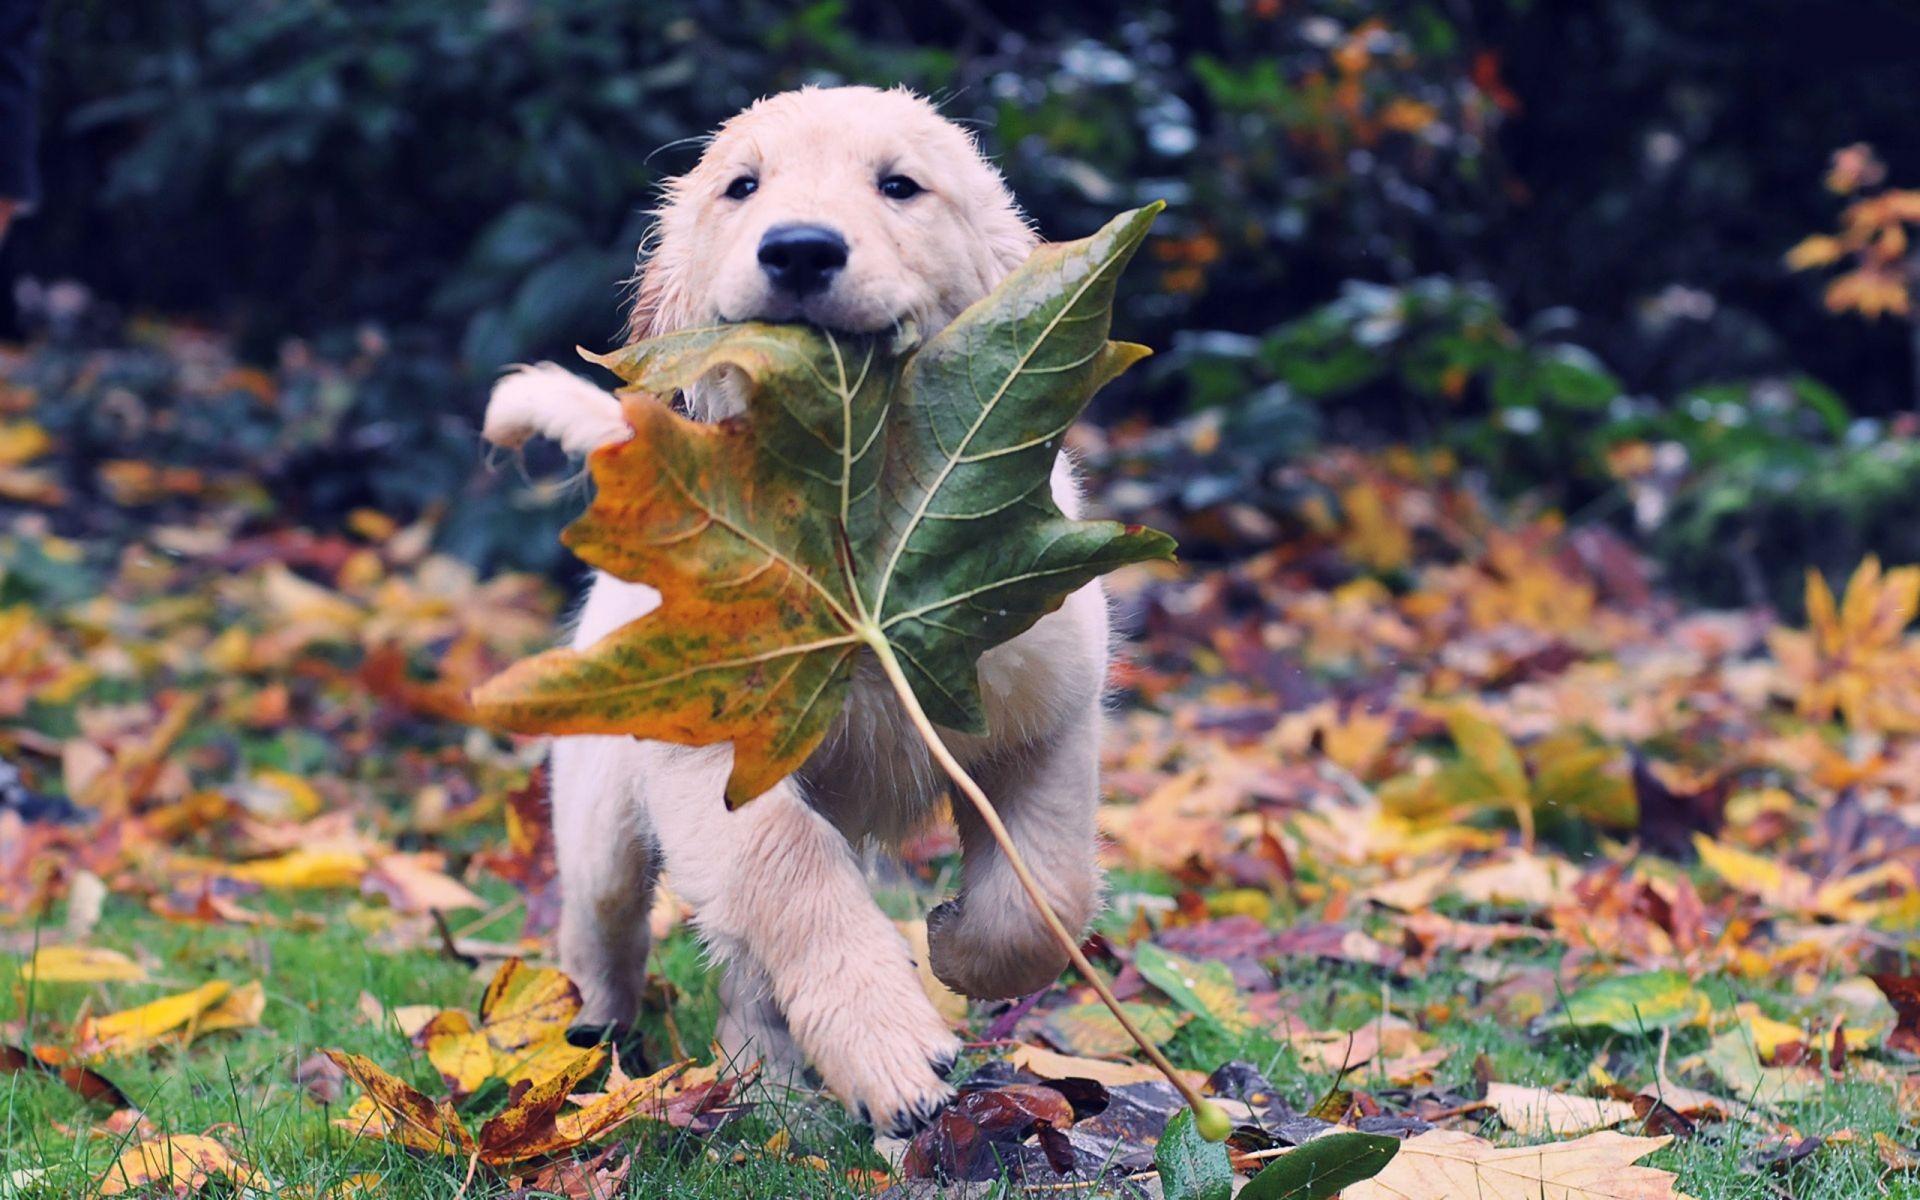 Cute, Labrador, Dog, Widescreen, High, Resolution, - Animal Fall Backgrounds - HD Wallpaper